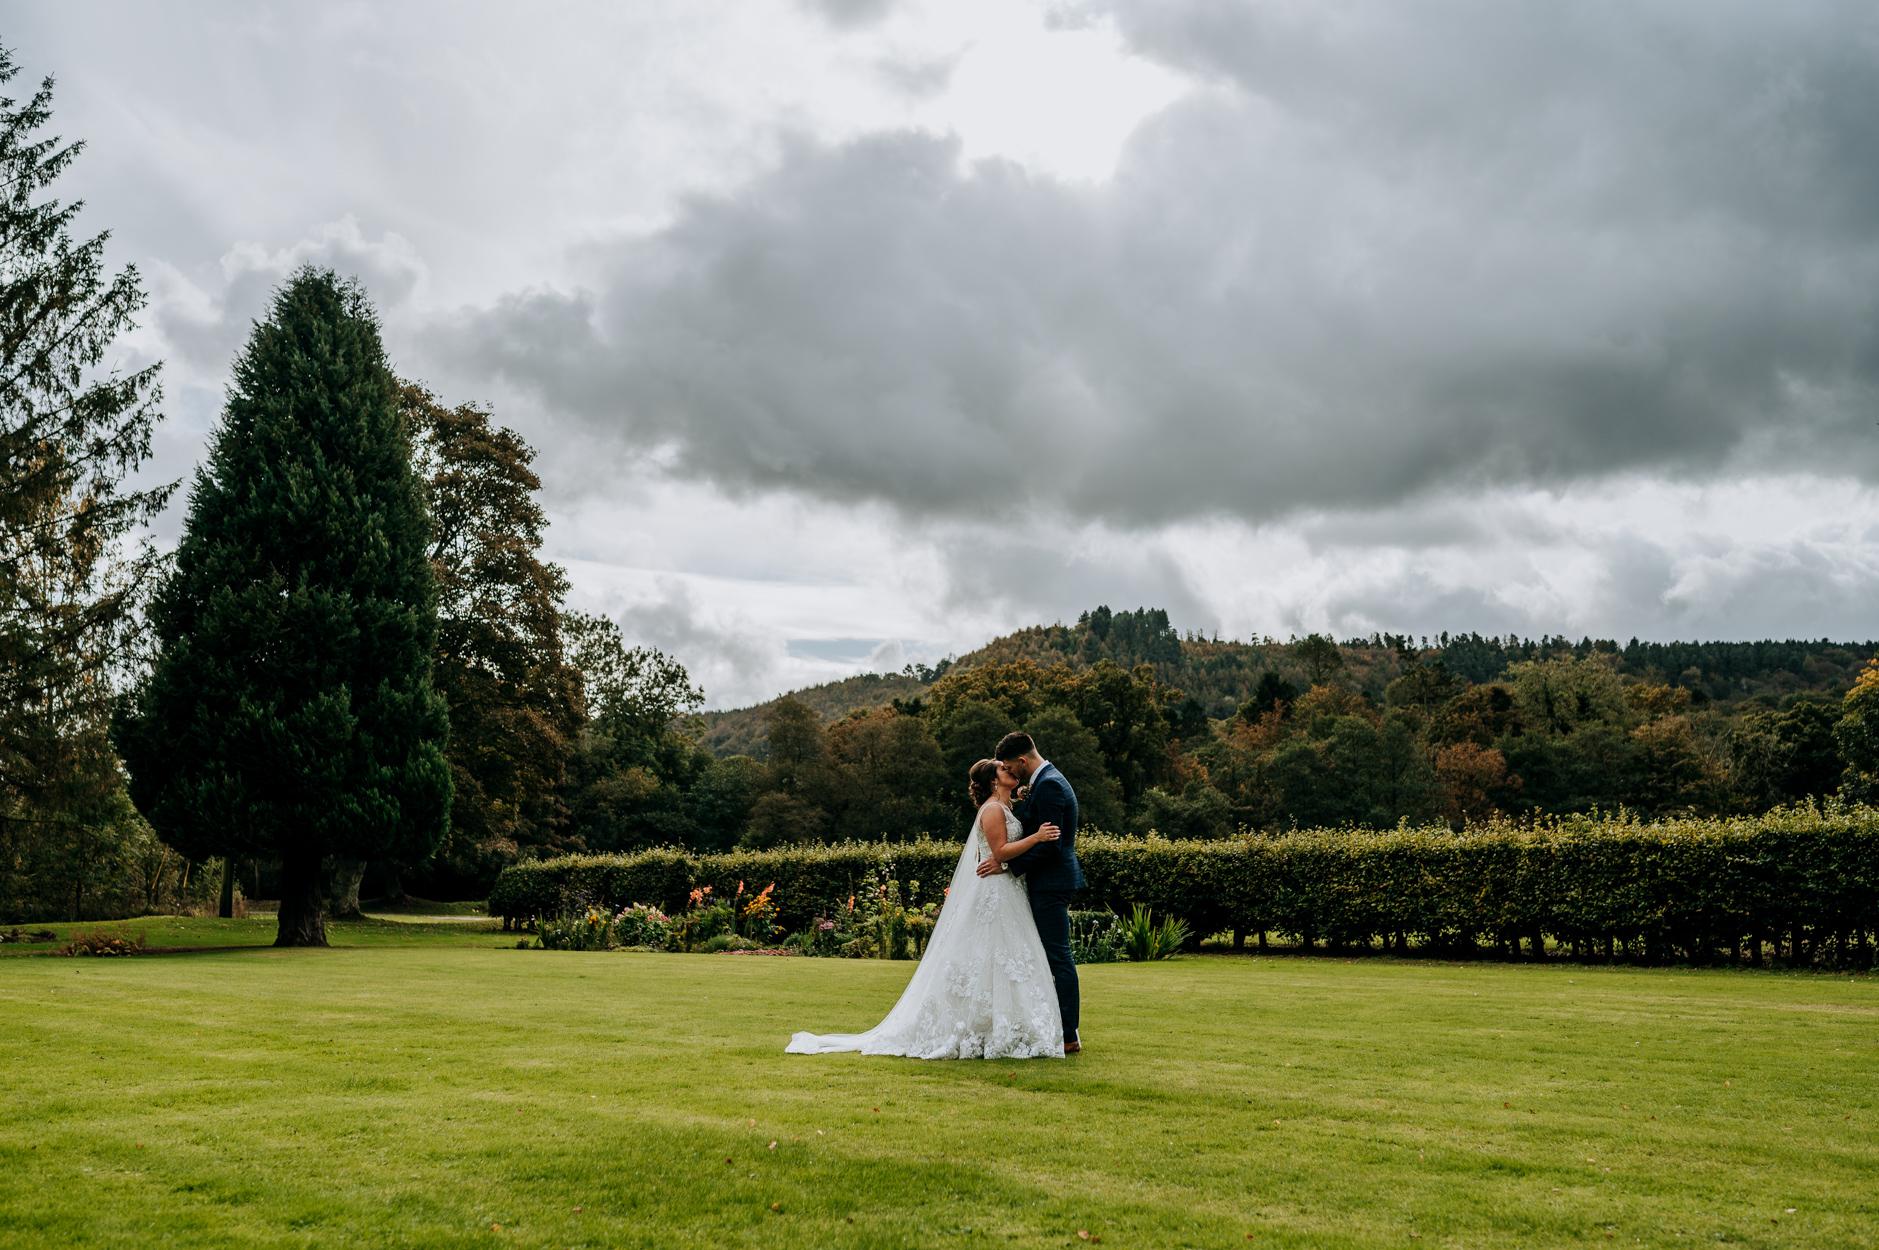 Hackness Grange Venue - North Yorkshire Wedding Photos | A portrait of the happy couple